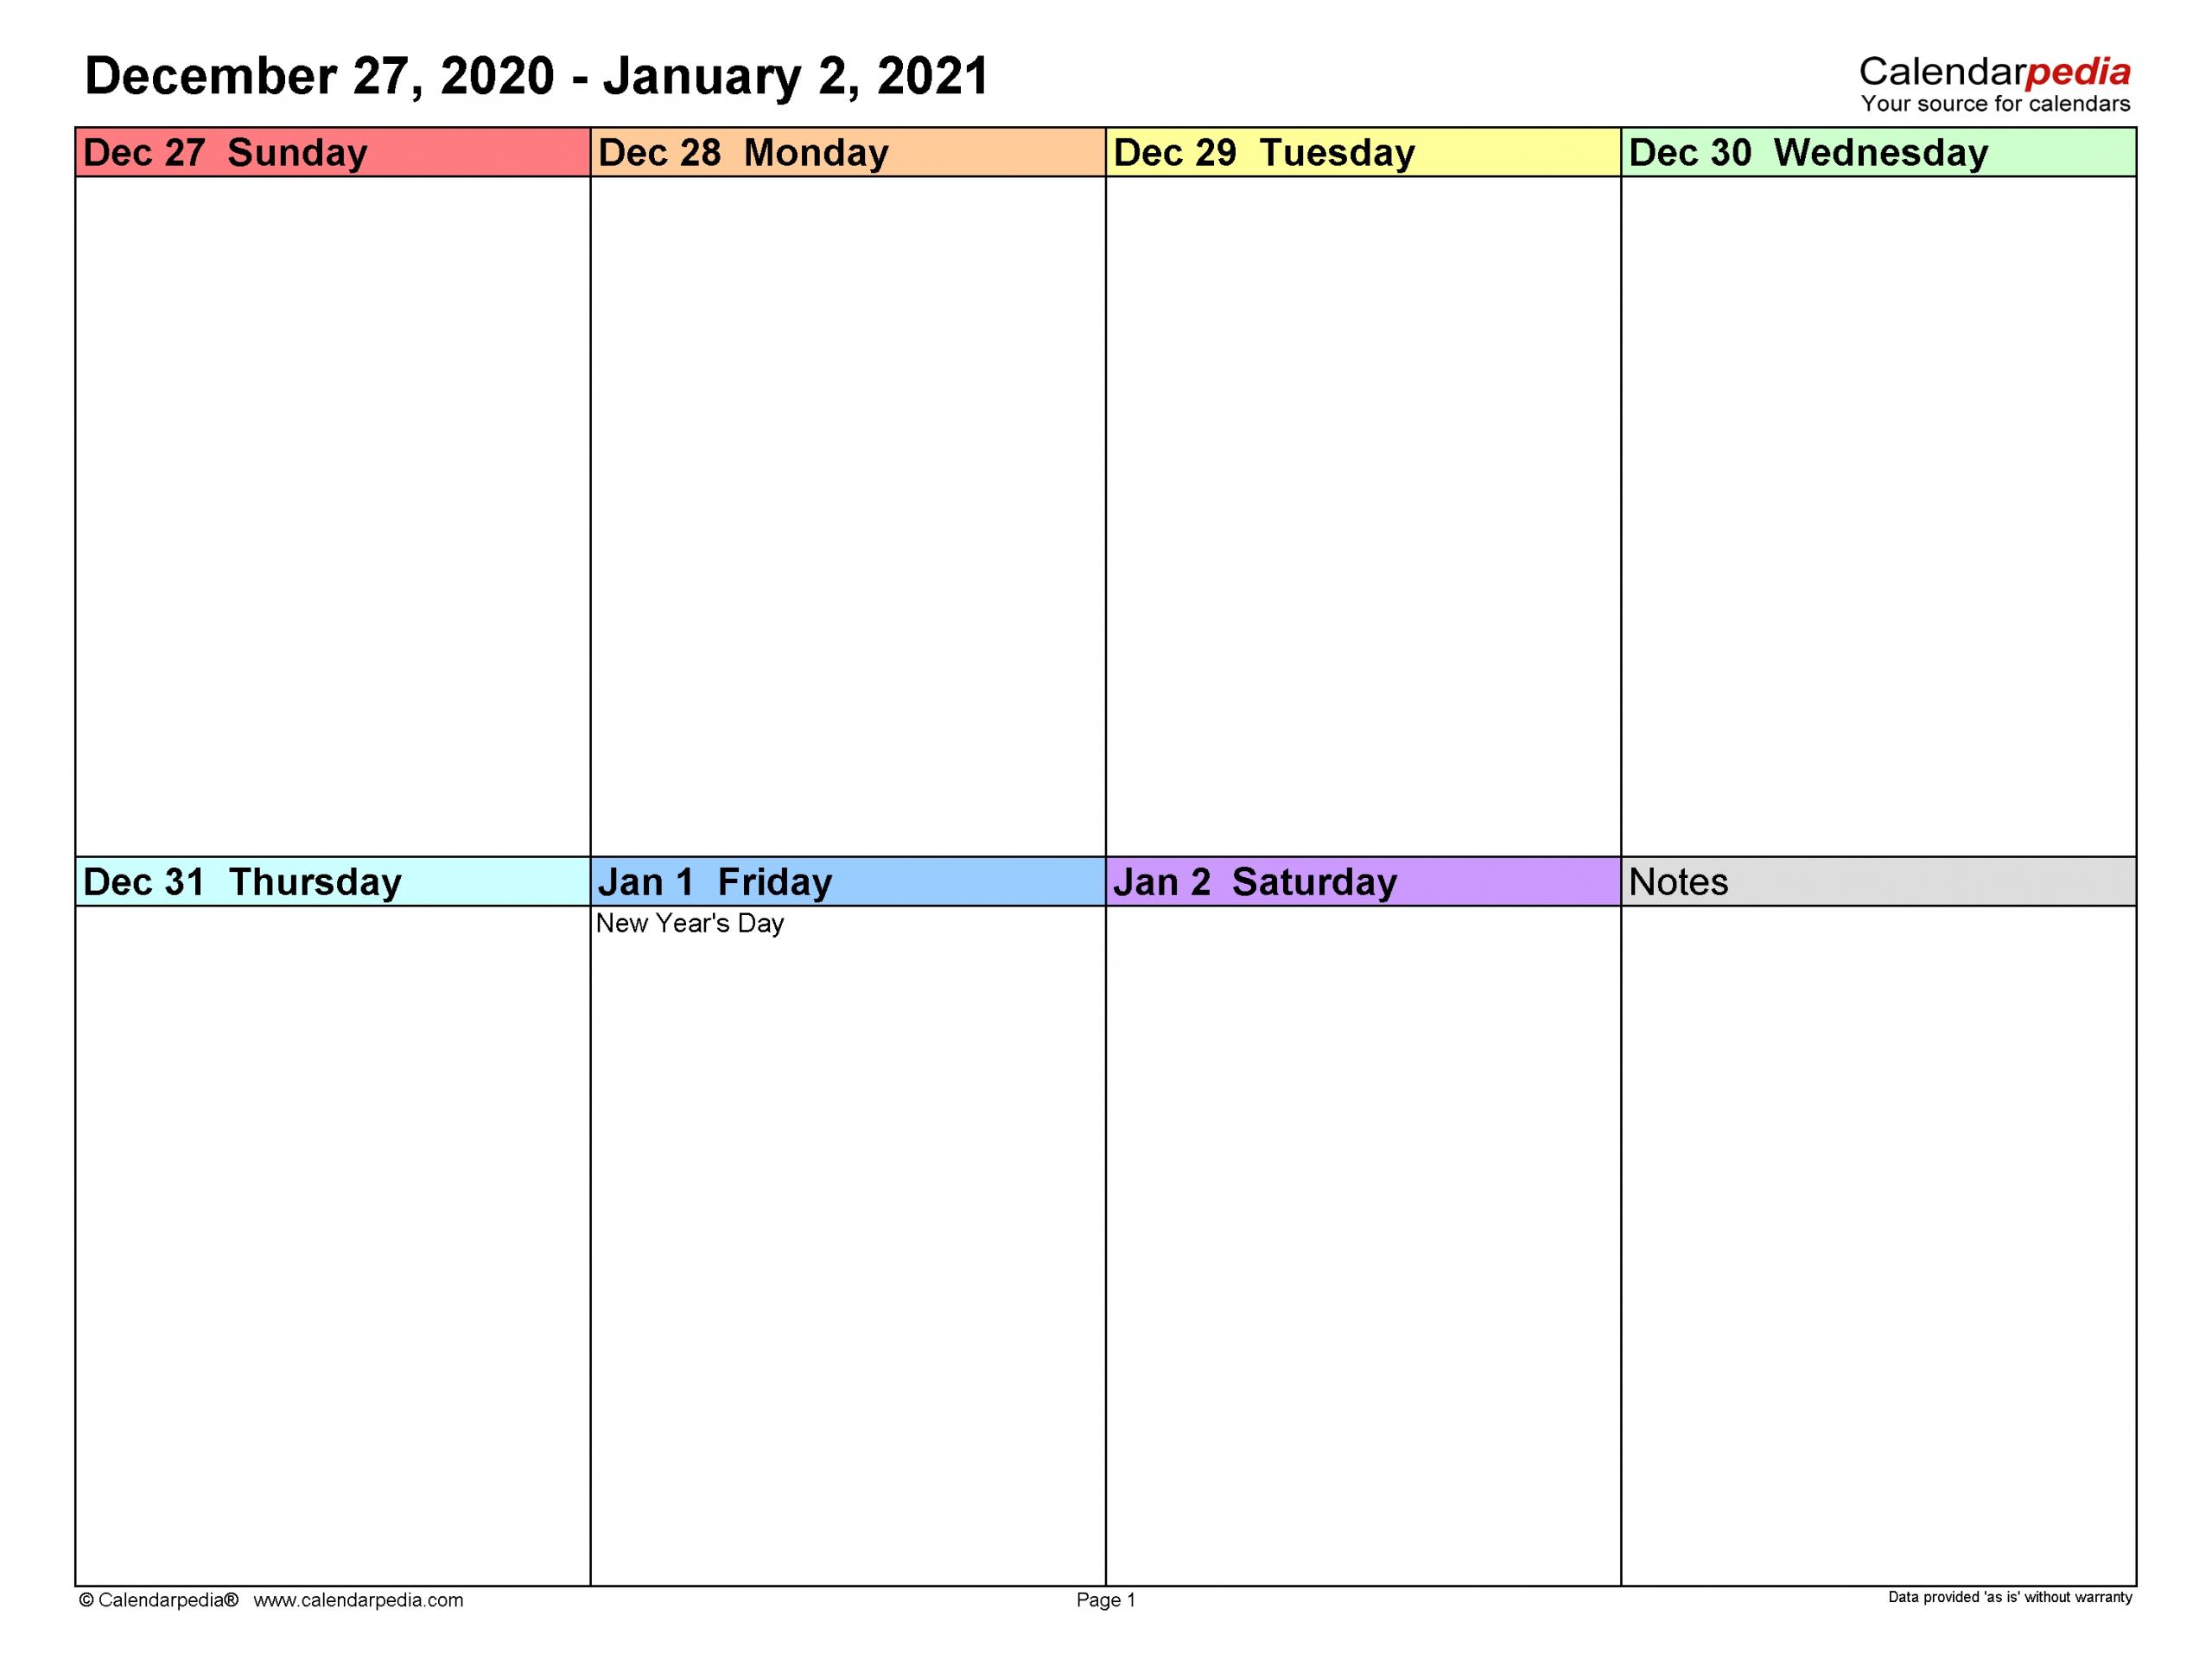 Take Free Printable Weekly Calendar With Time Slots 2021